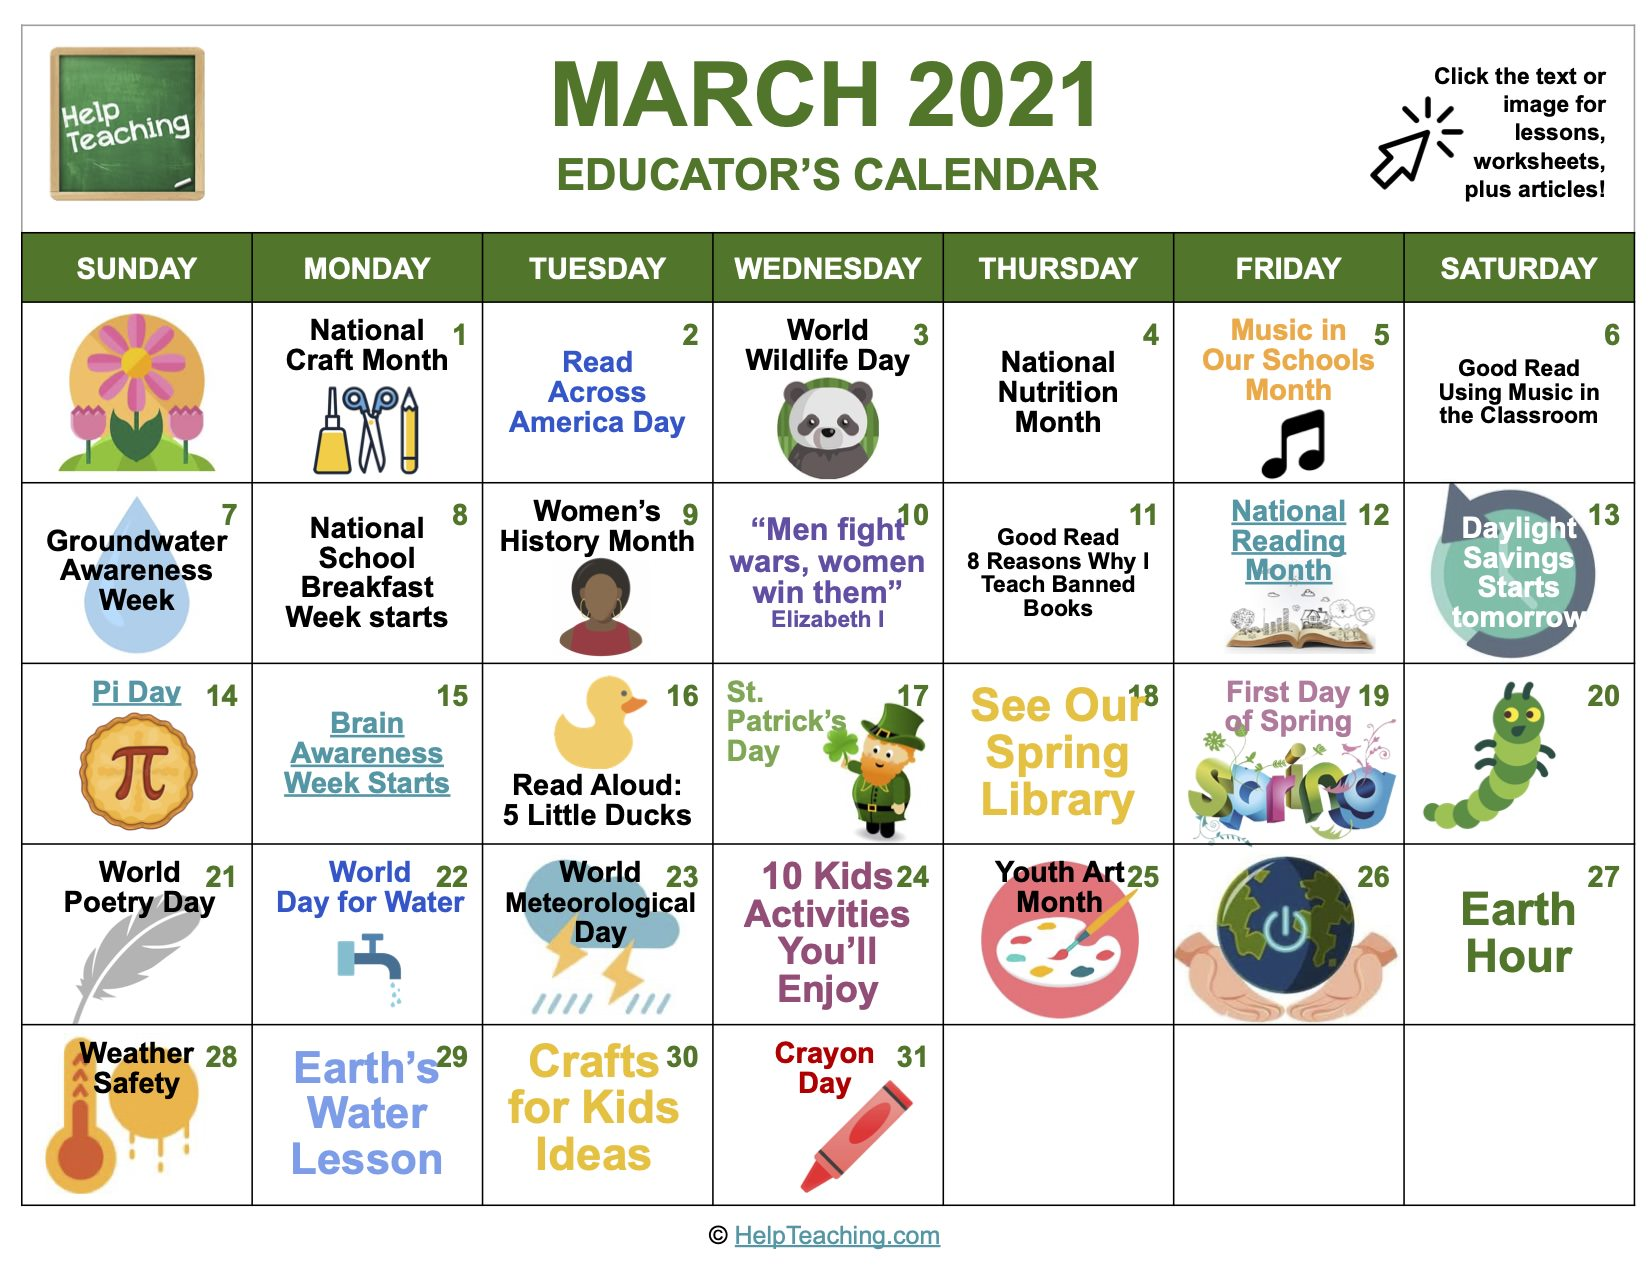 March 2021 Educator's Calendar